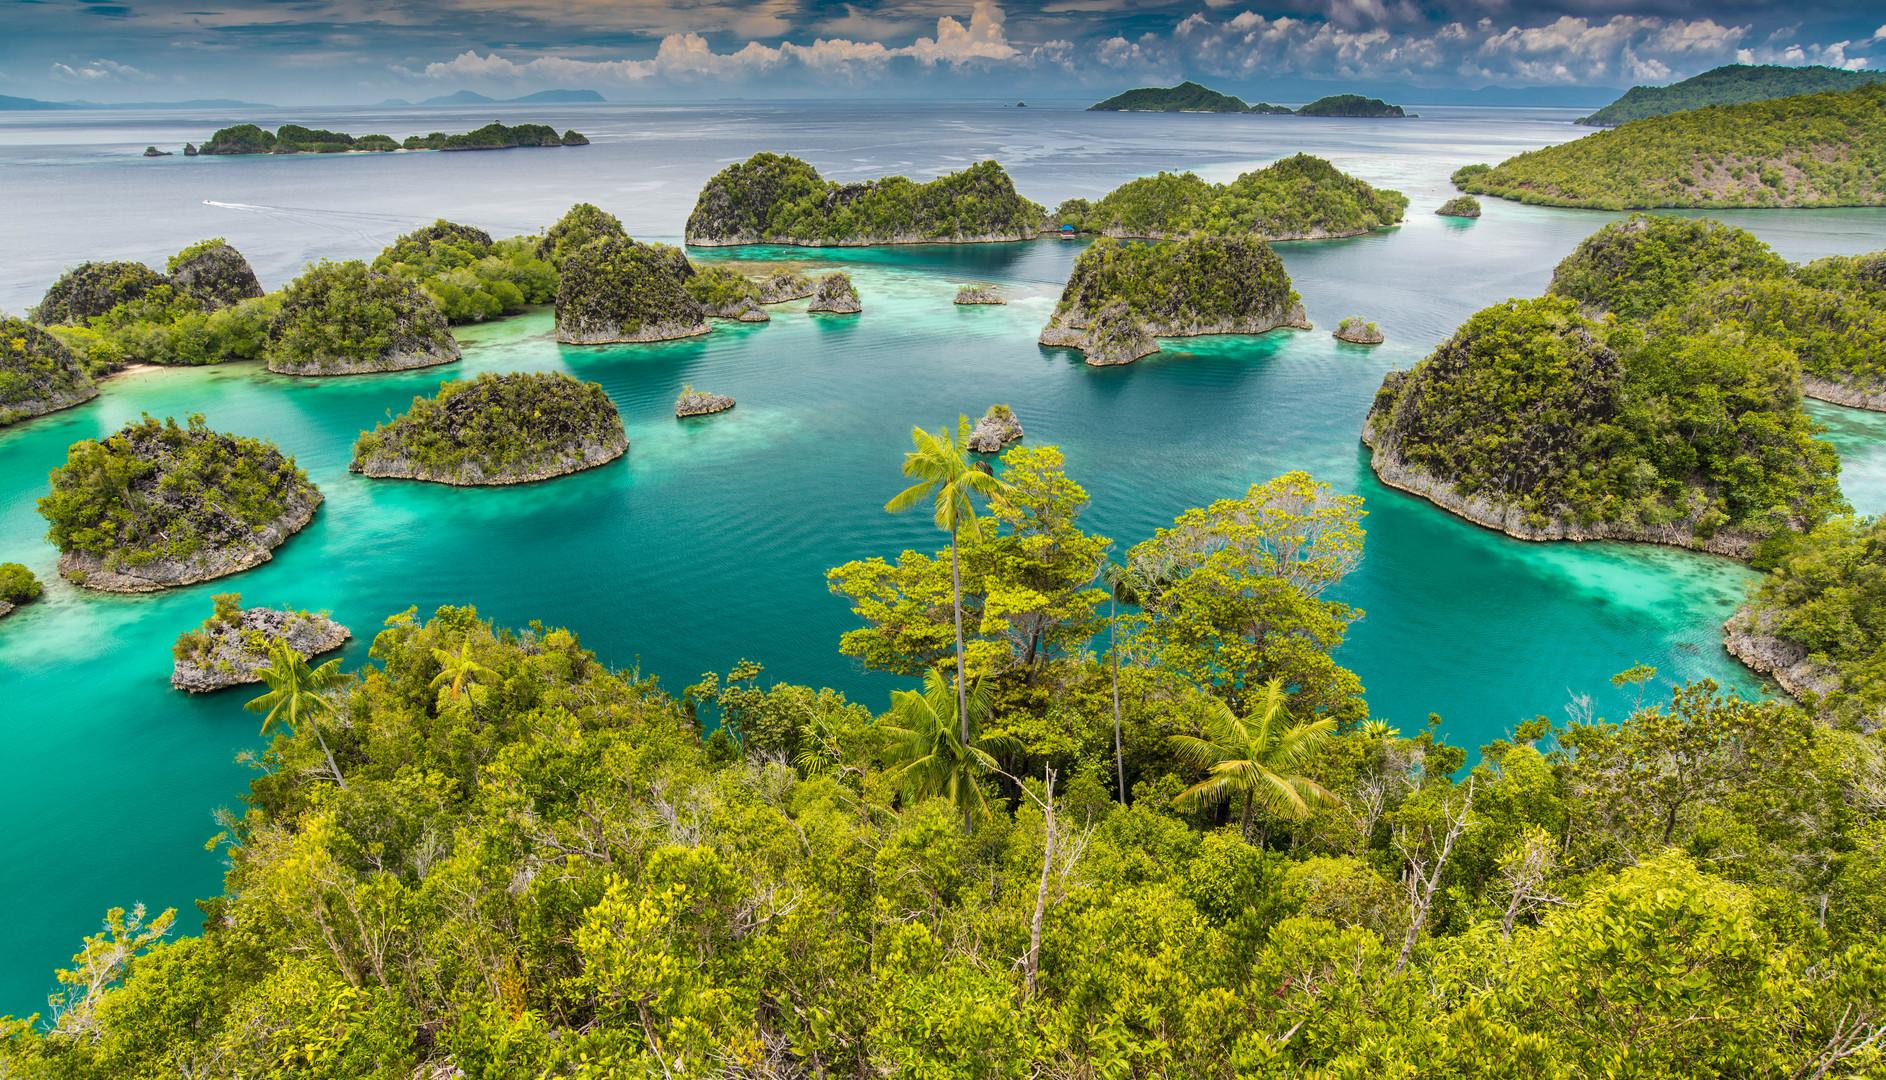 Fam Island - Raja Ampat